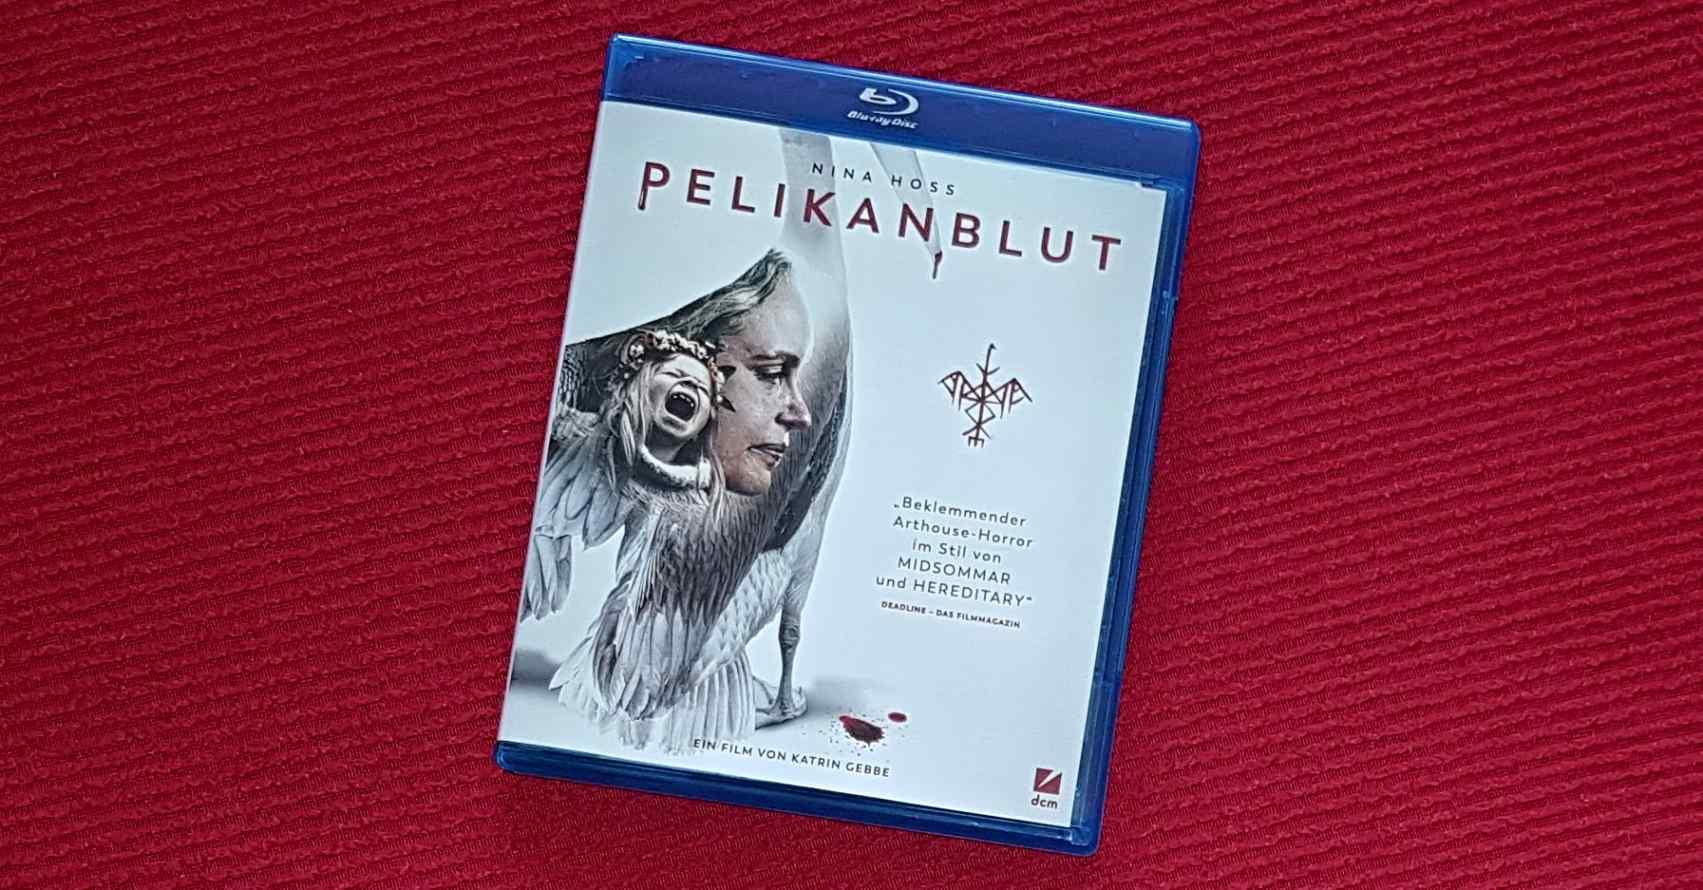 Pelikanblut-Packshot